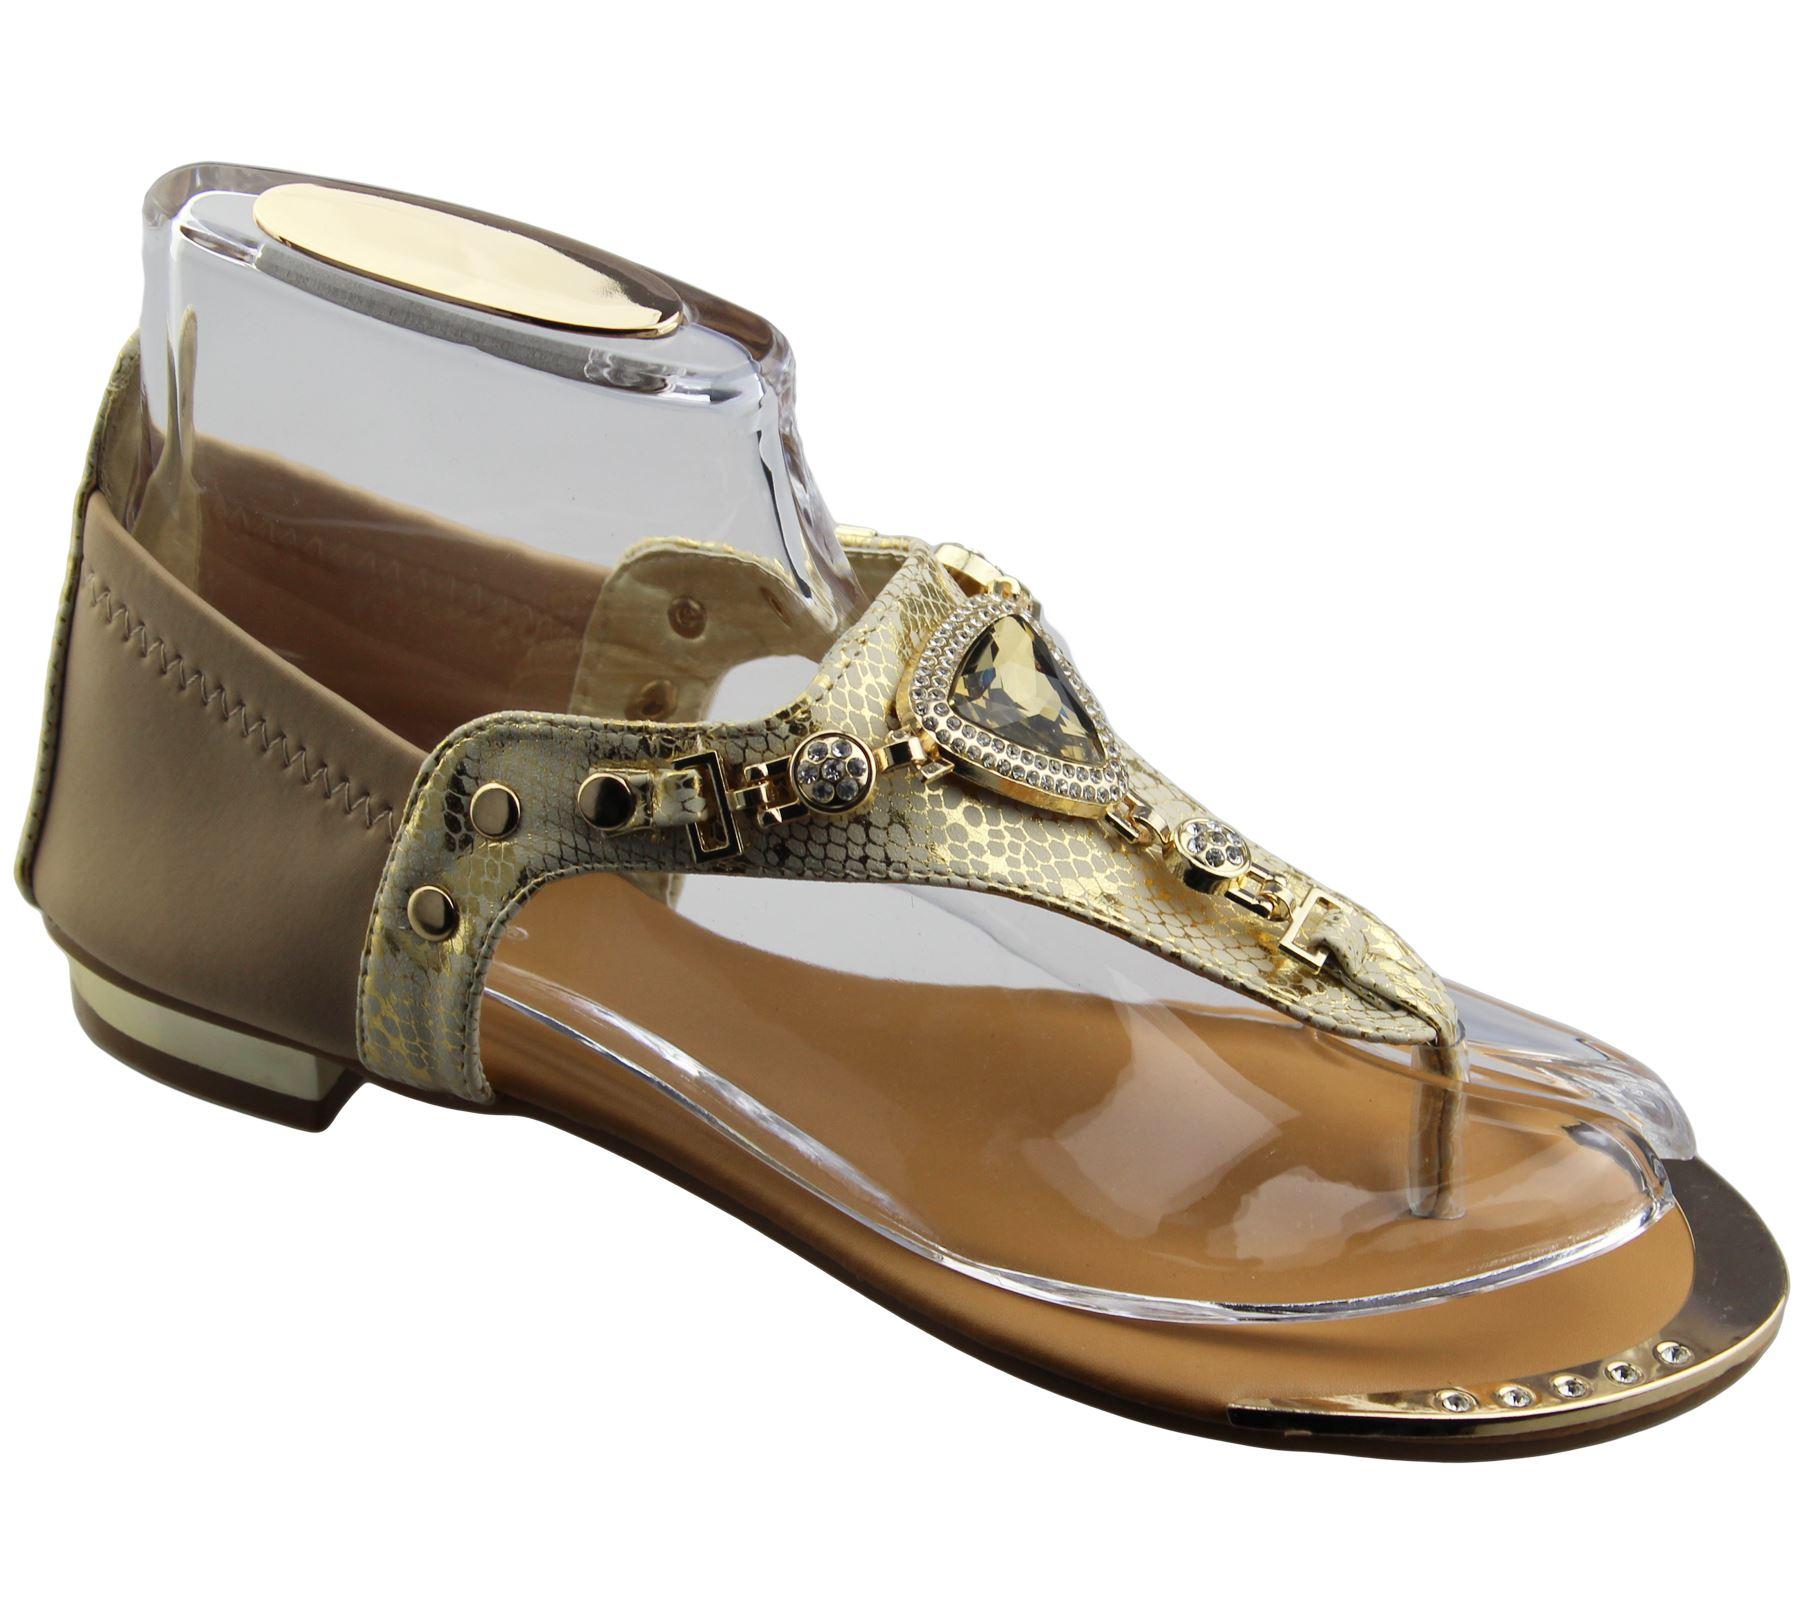 Womens-Flat-Summer-Sandals-Ladies-Diamante-Wedding-Toe-Post-Casual-Slipper thumbnail 19